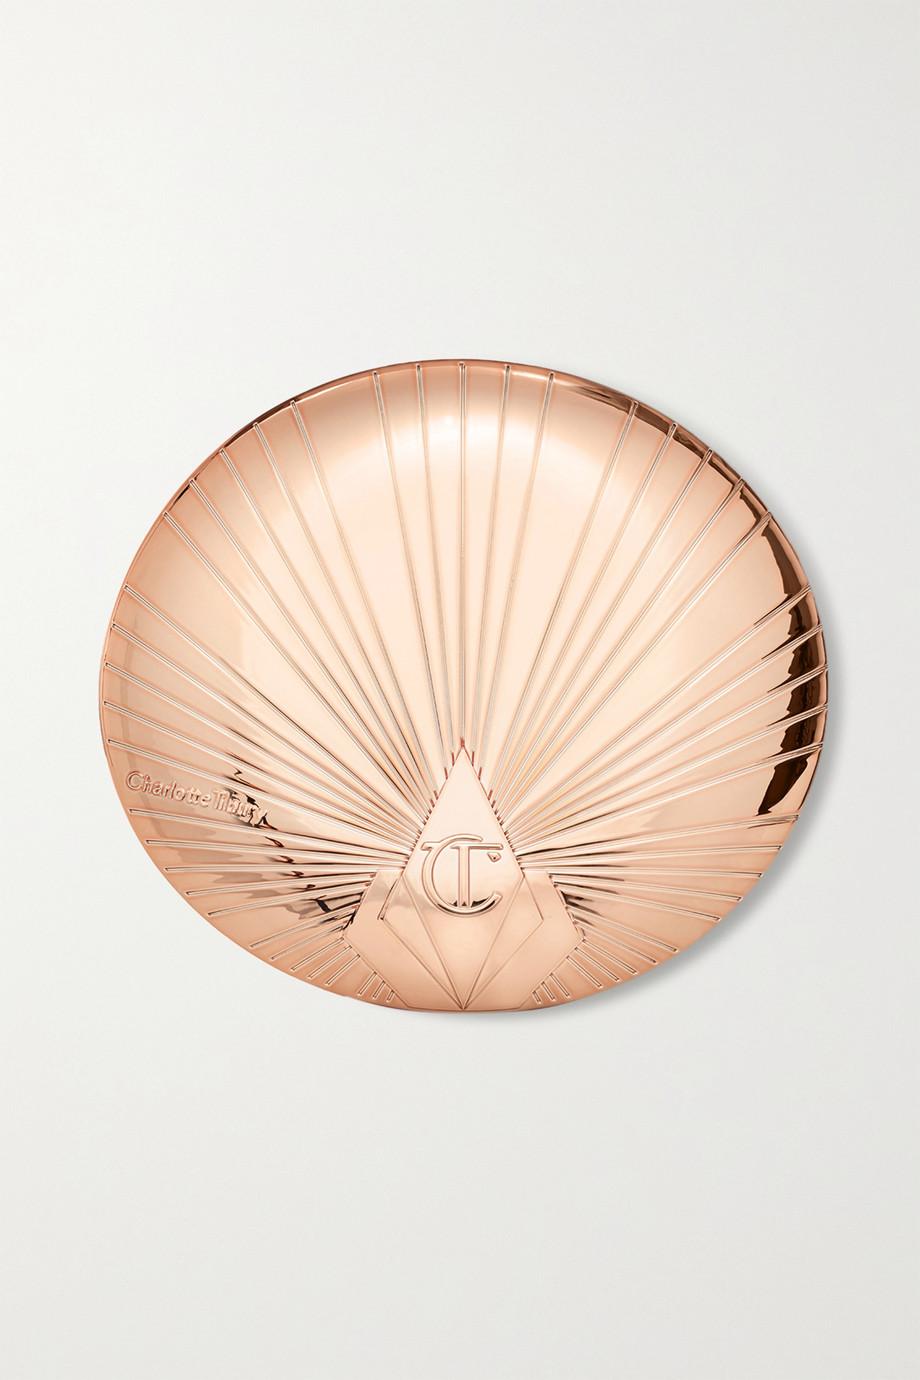 Charlotte Tilbury Poudre bronzante Airbrush Flawless, Deep